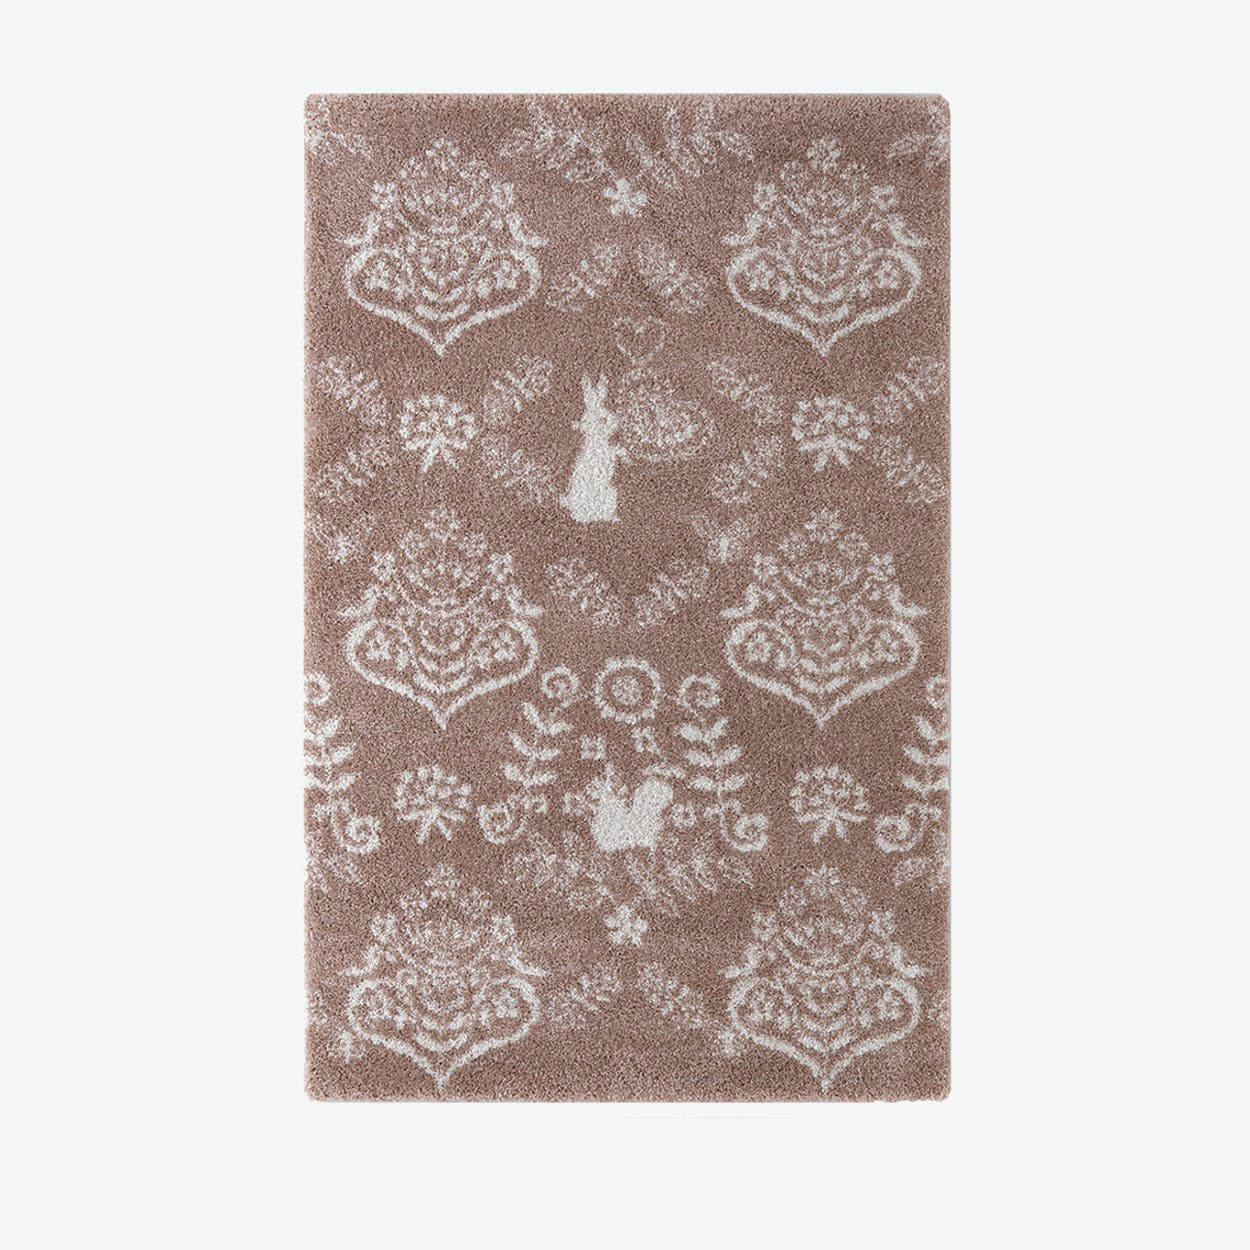 Rabbit Rug - Pink - by S. Katoh -  135 x 190 cm